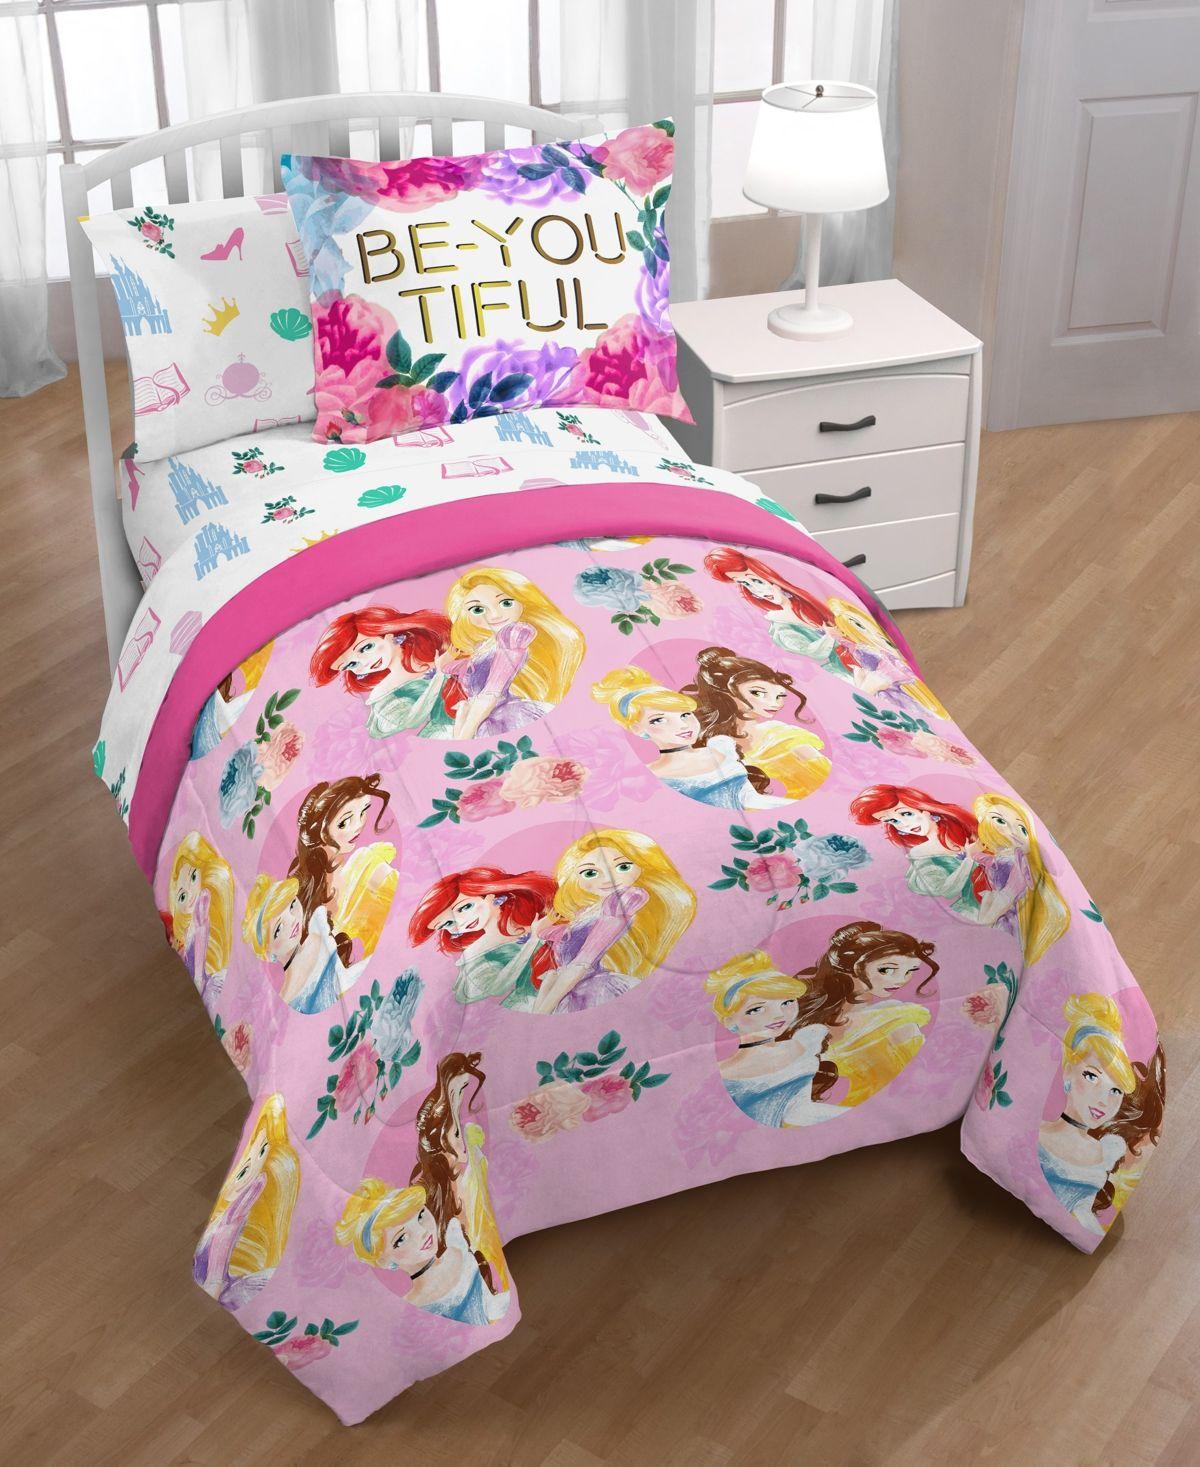 Disney Princess Princess Sassy Twin Bed In A Bag Reviews Bed In A Bag Bed Bath Macy S Bed In A Bag Mattress Furniture Cozy Bedding Sets